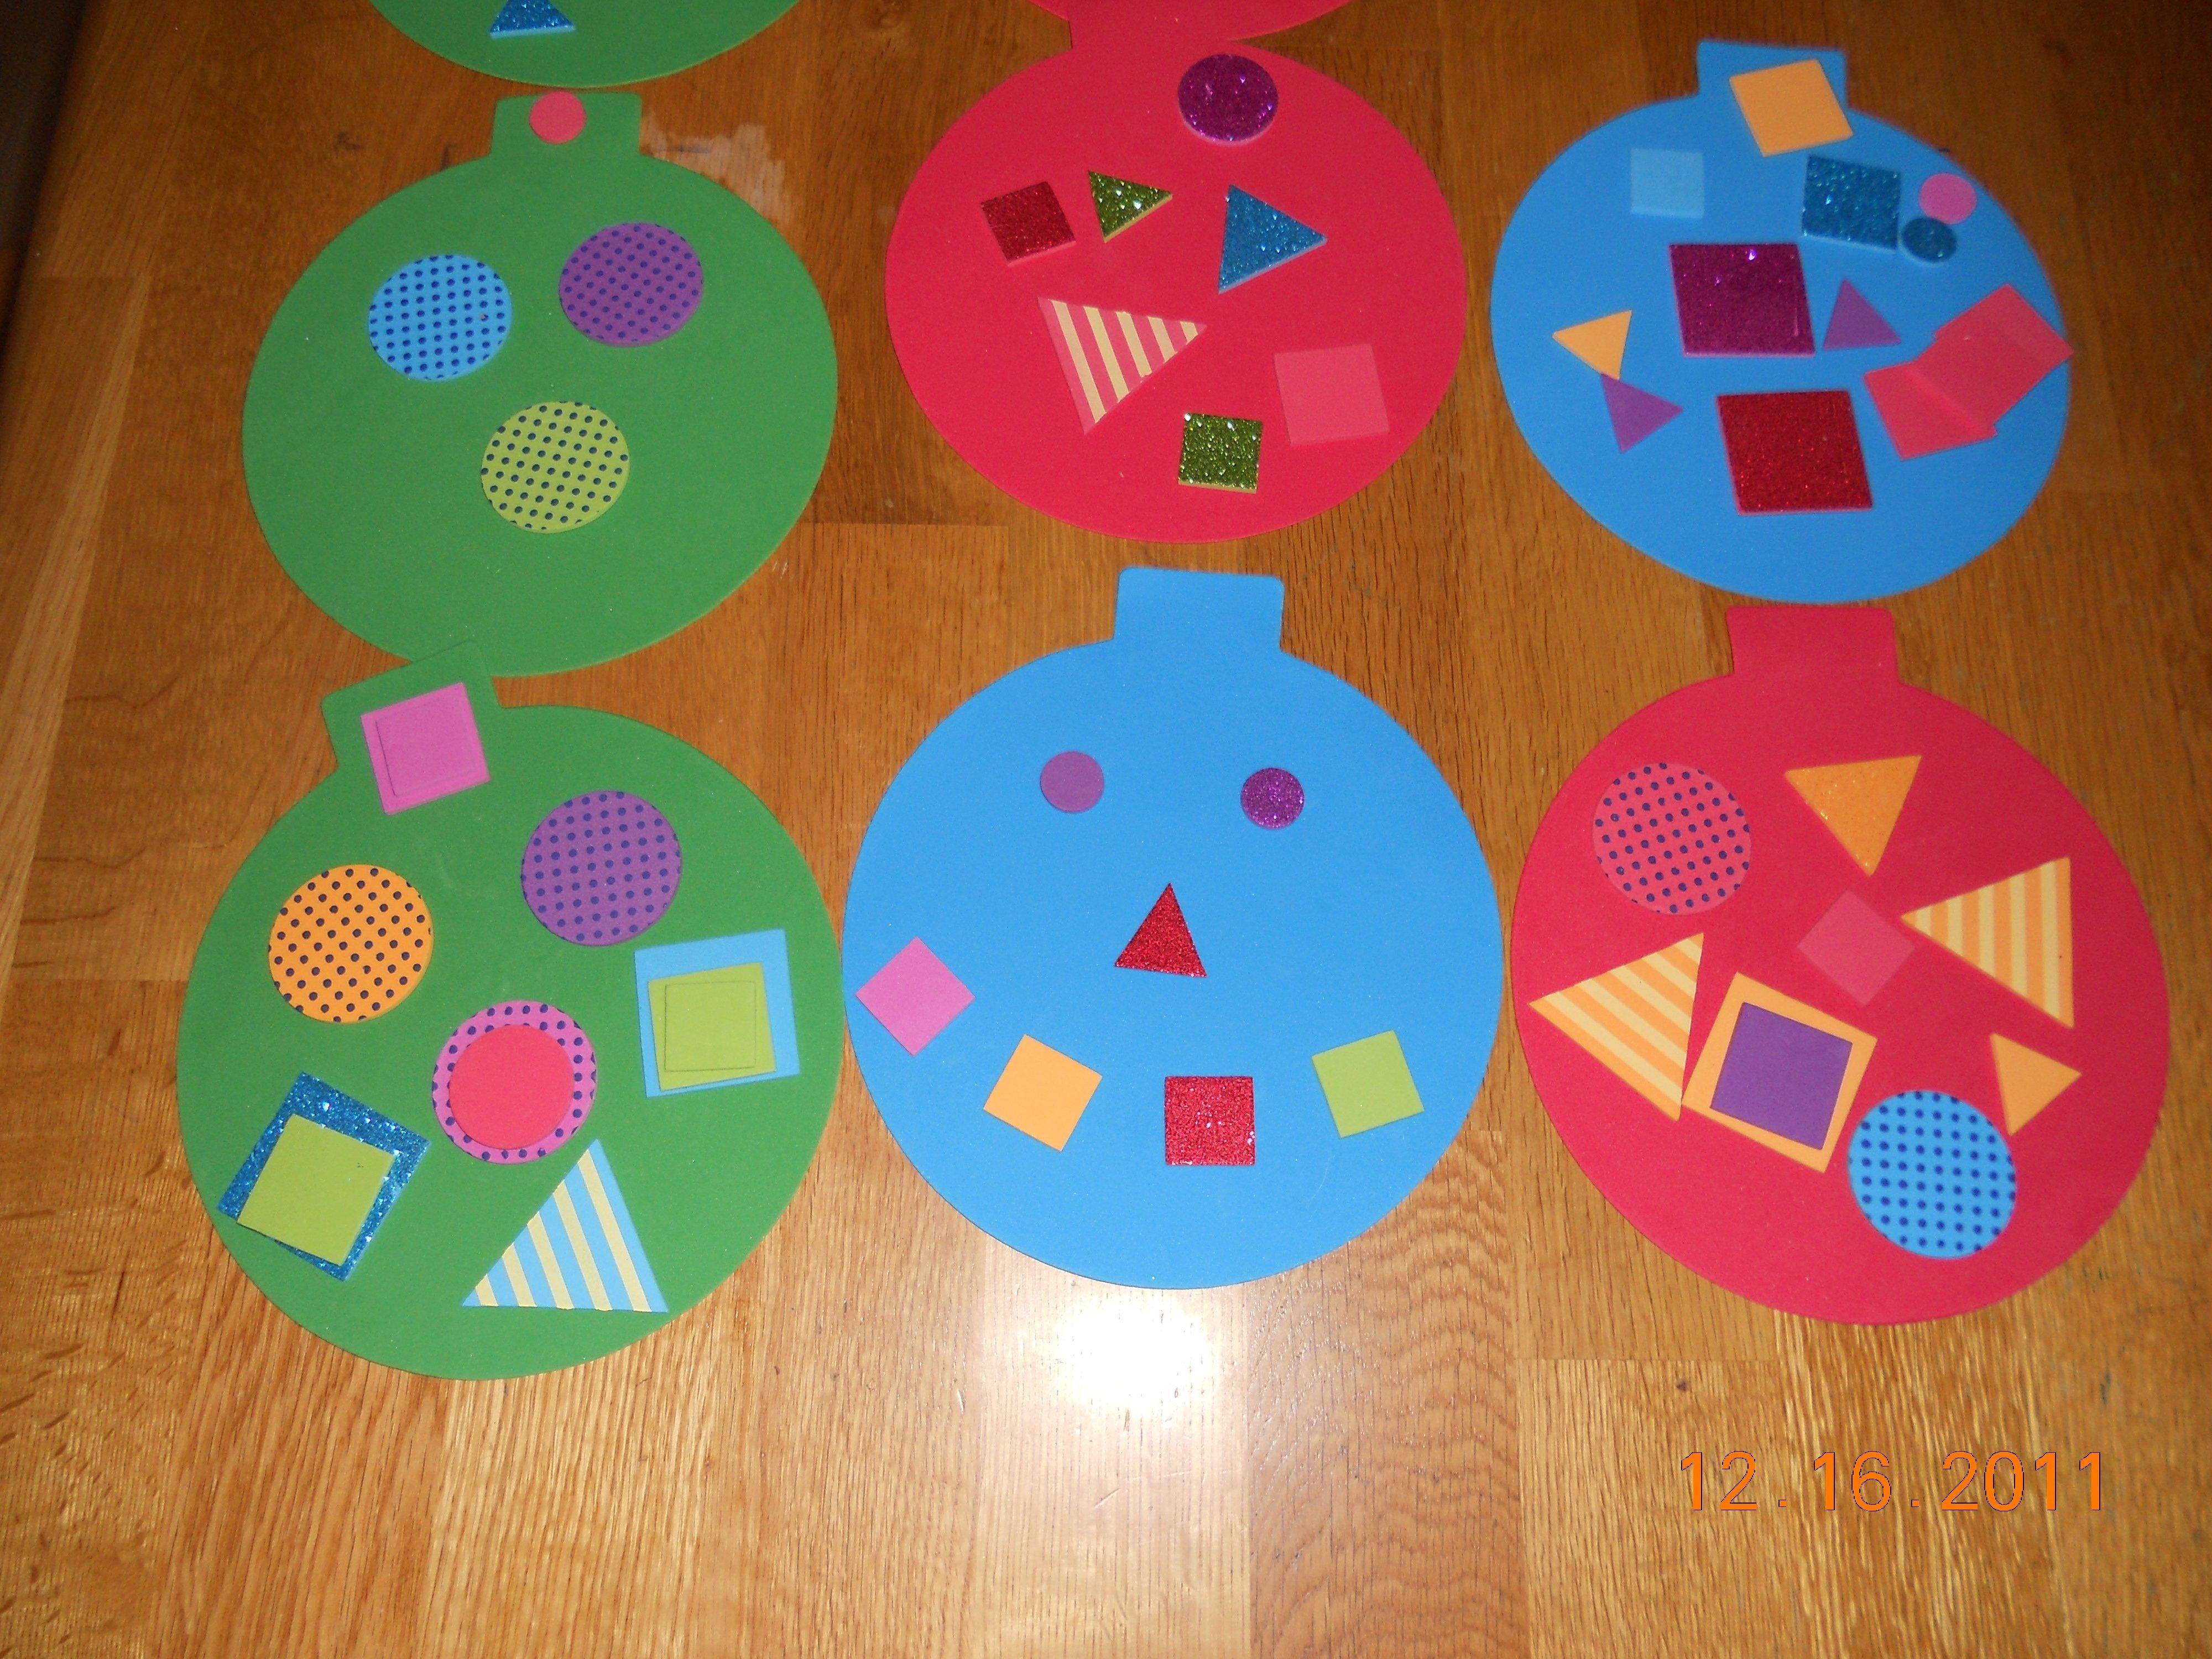 10 Stylish Christmas Craft Ideas For Kids To Make 15 fun and easy christmas craft ideas for kids miss lassy 1 2021